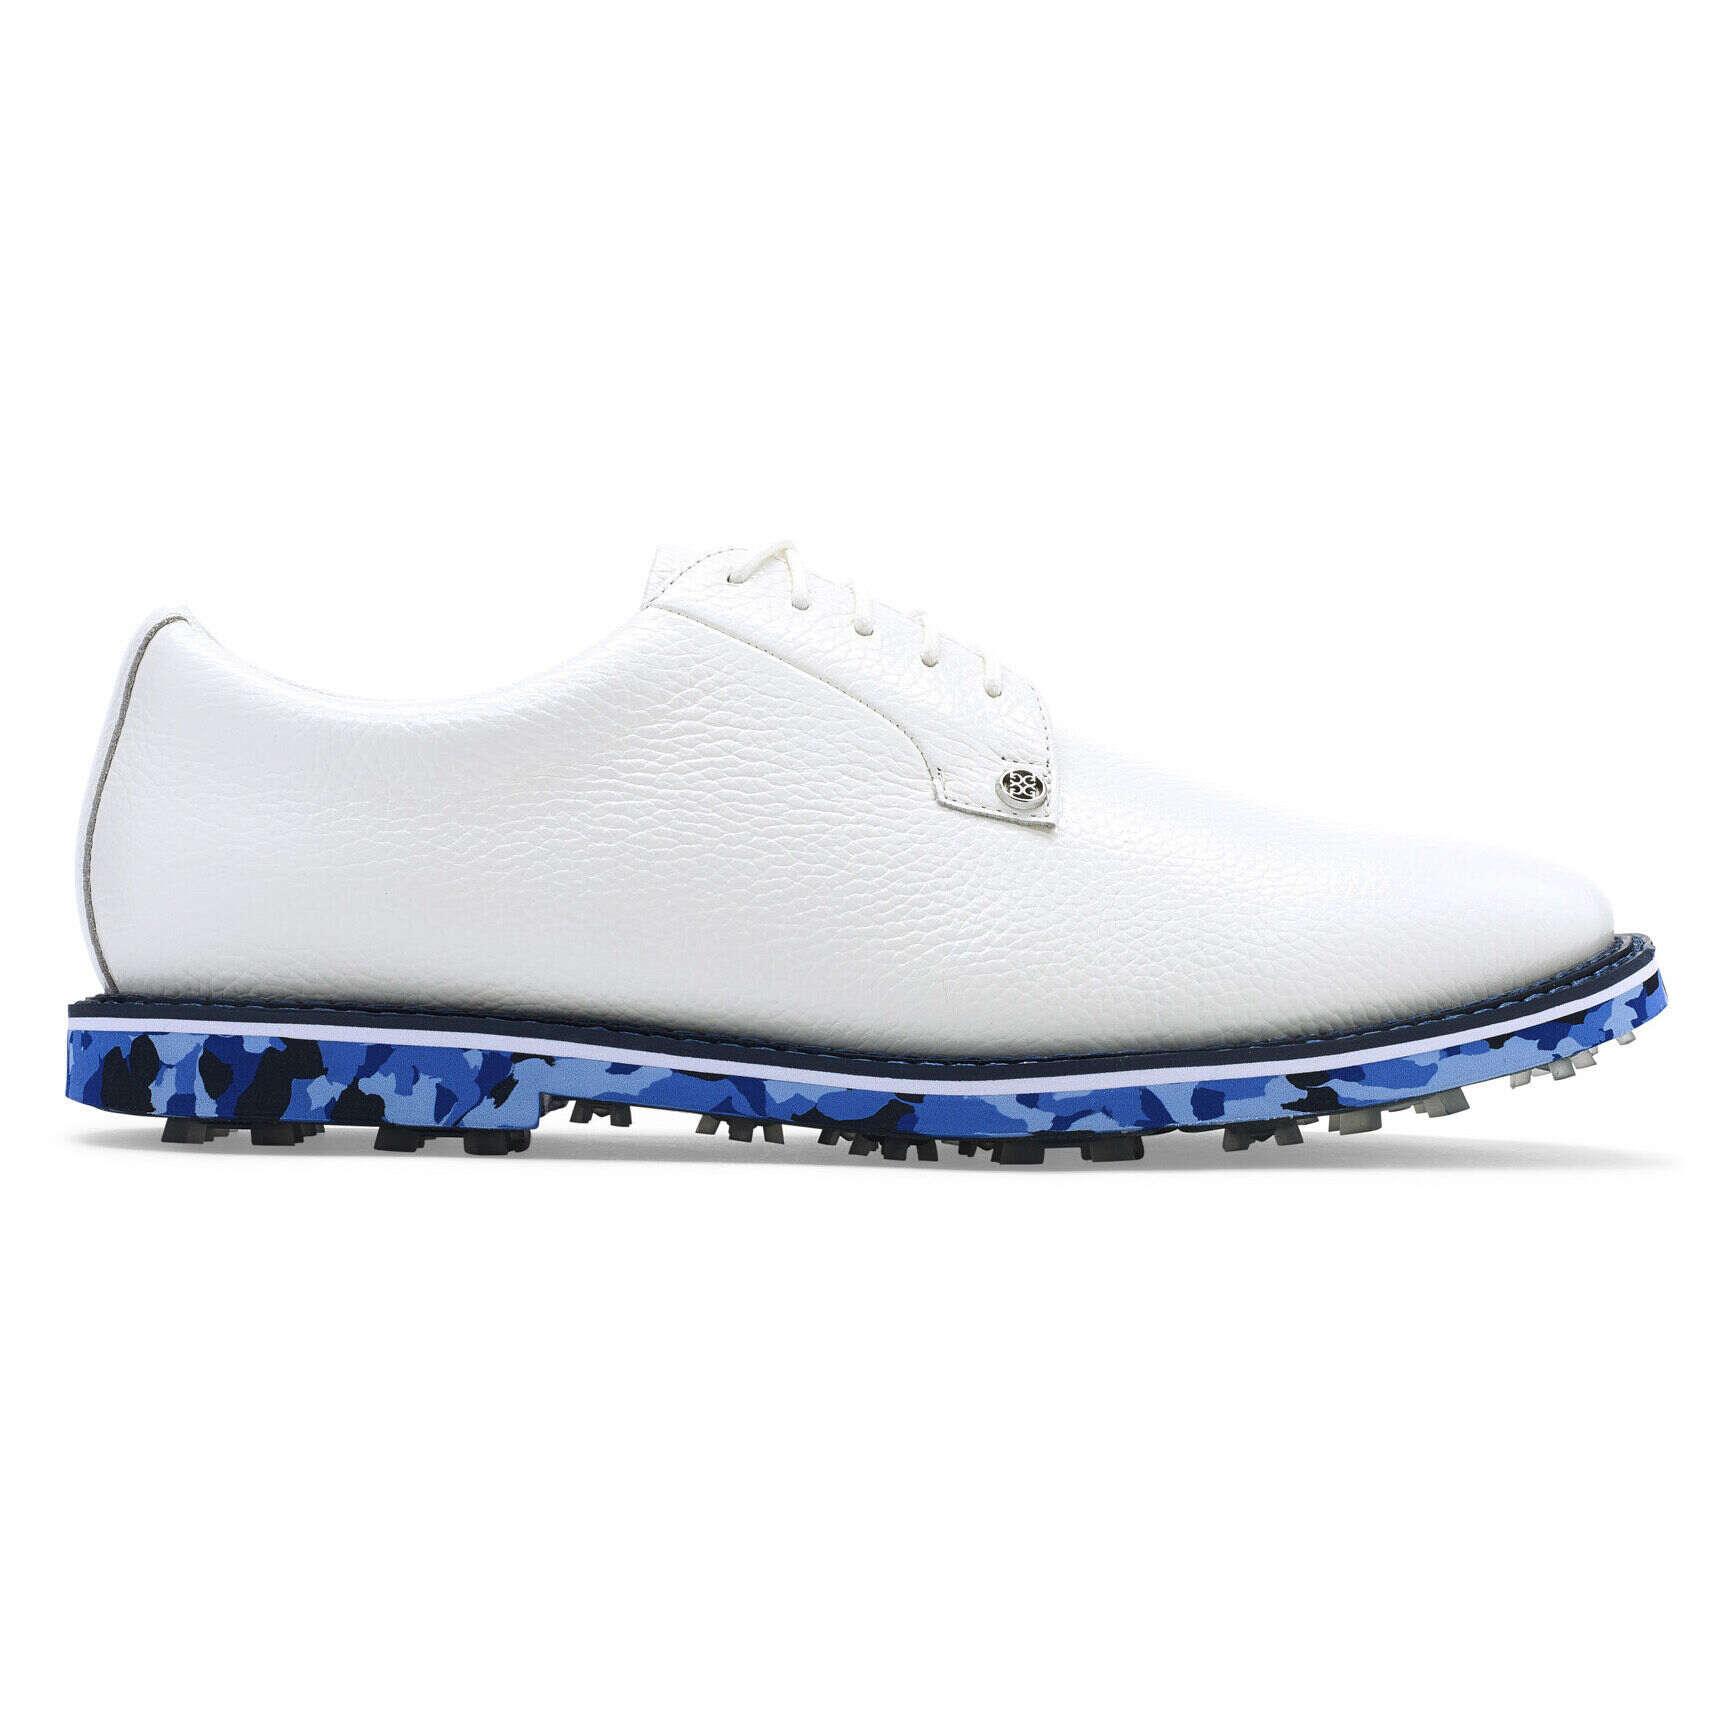 G/FORE Camo Gallivanter Men's Golf Shoe